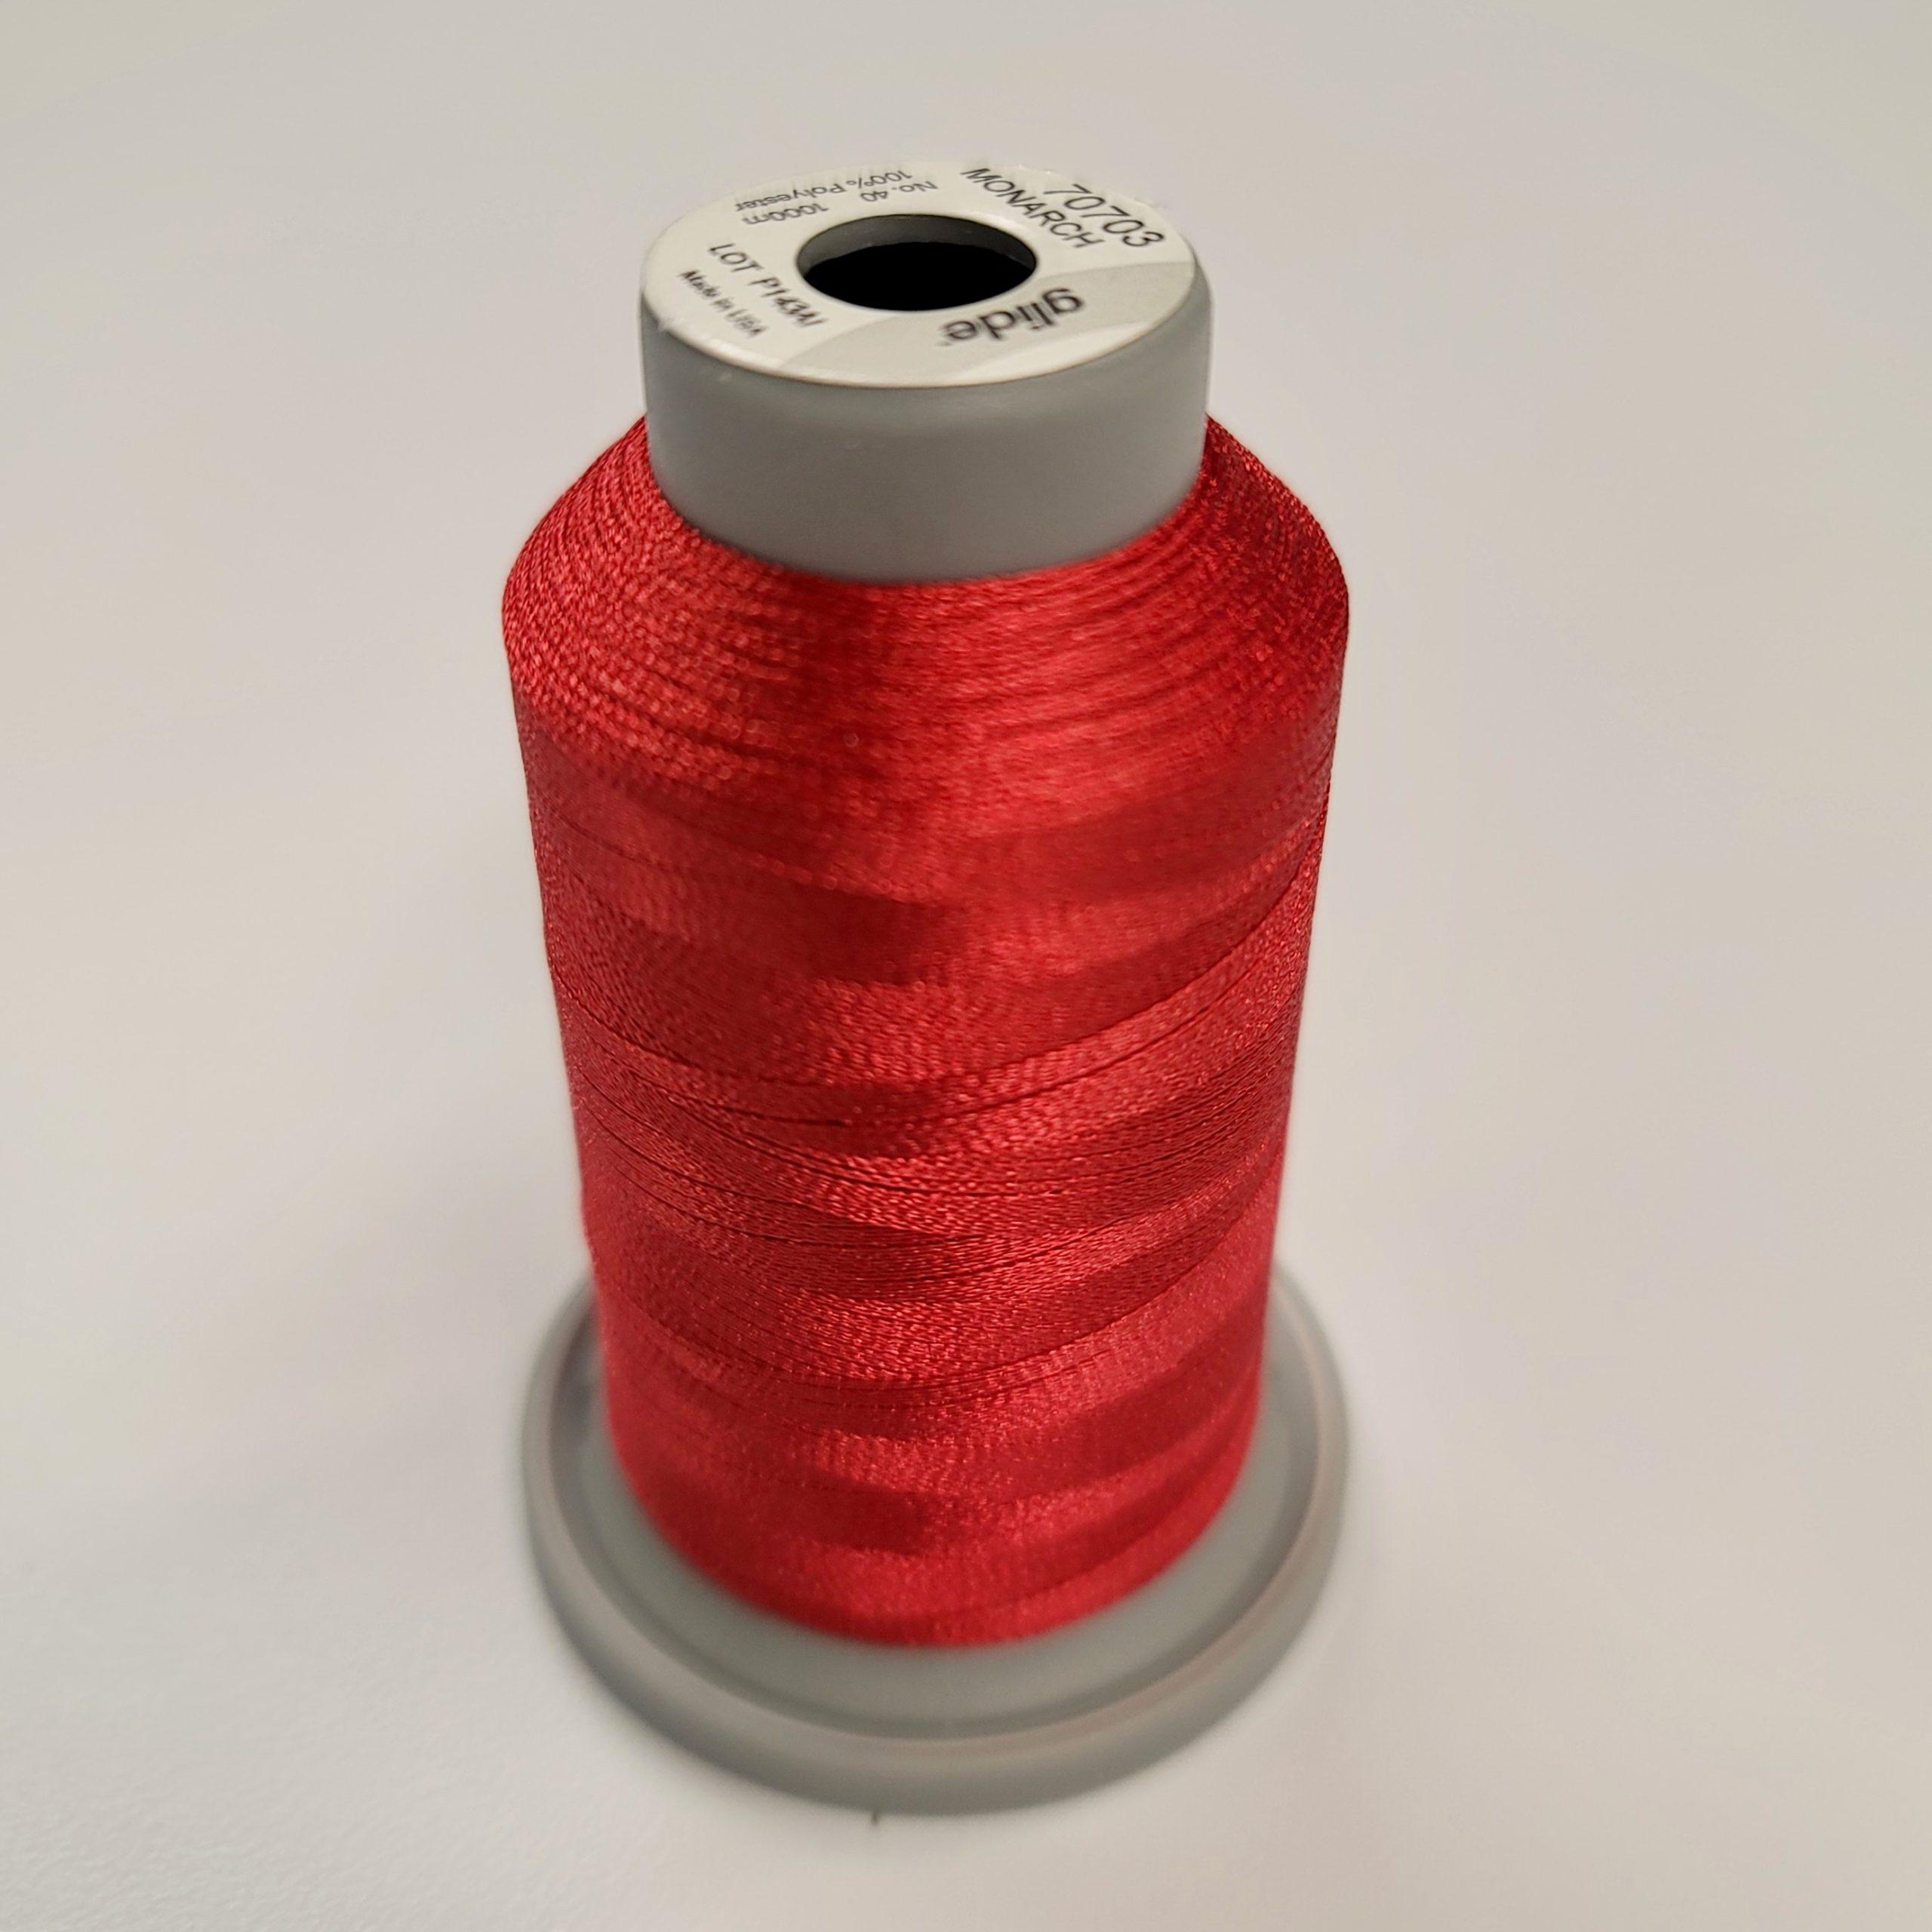 monarch red glide thread spool